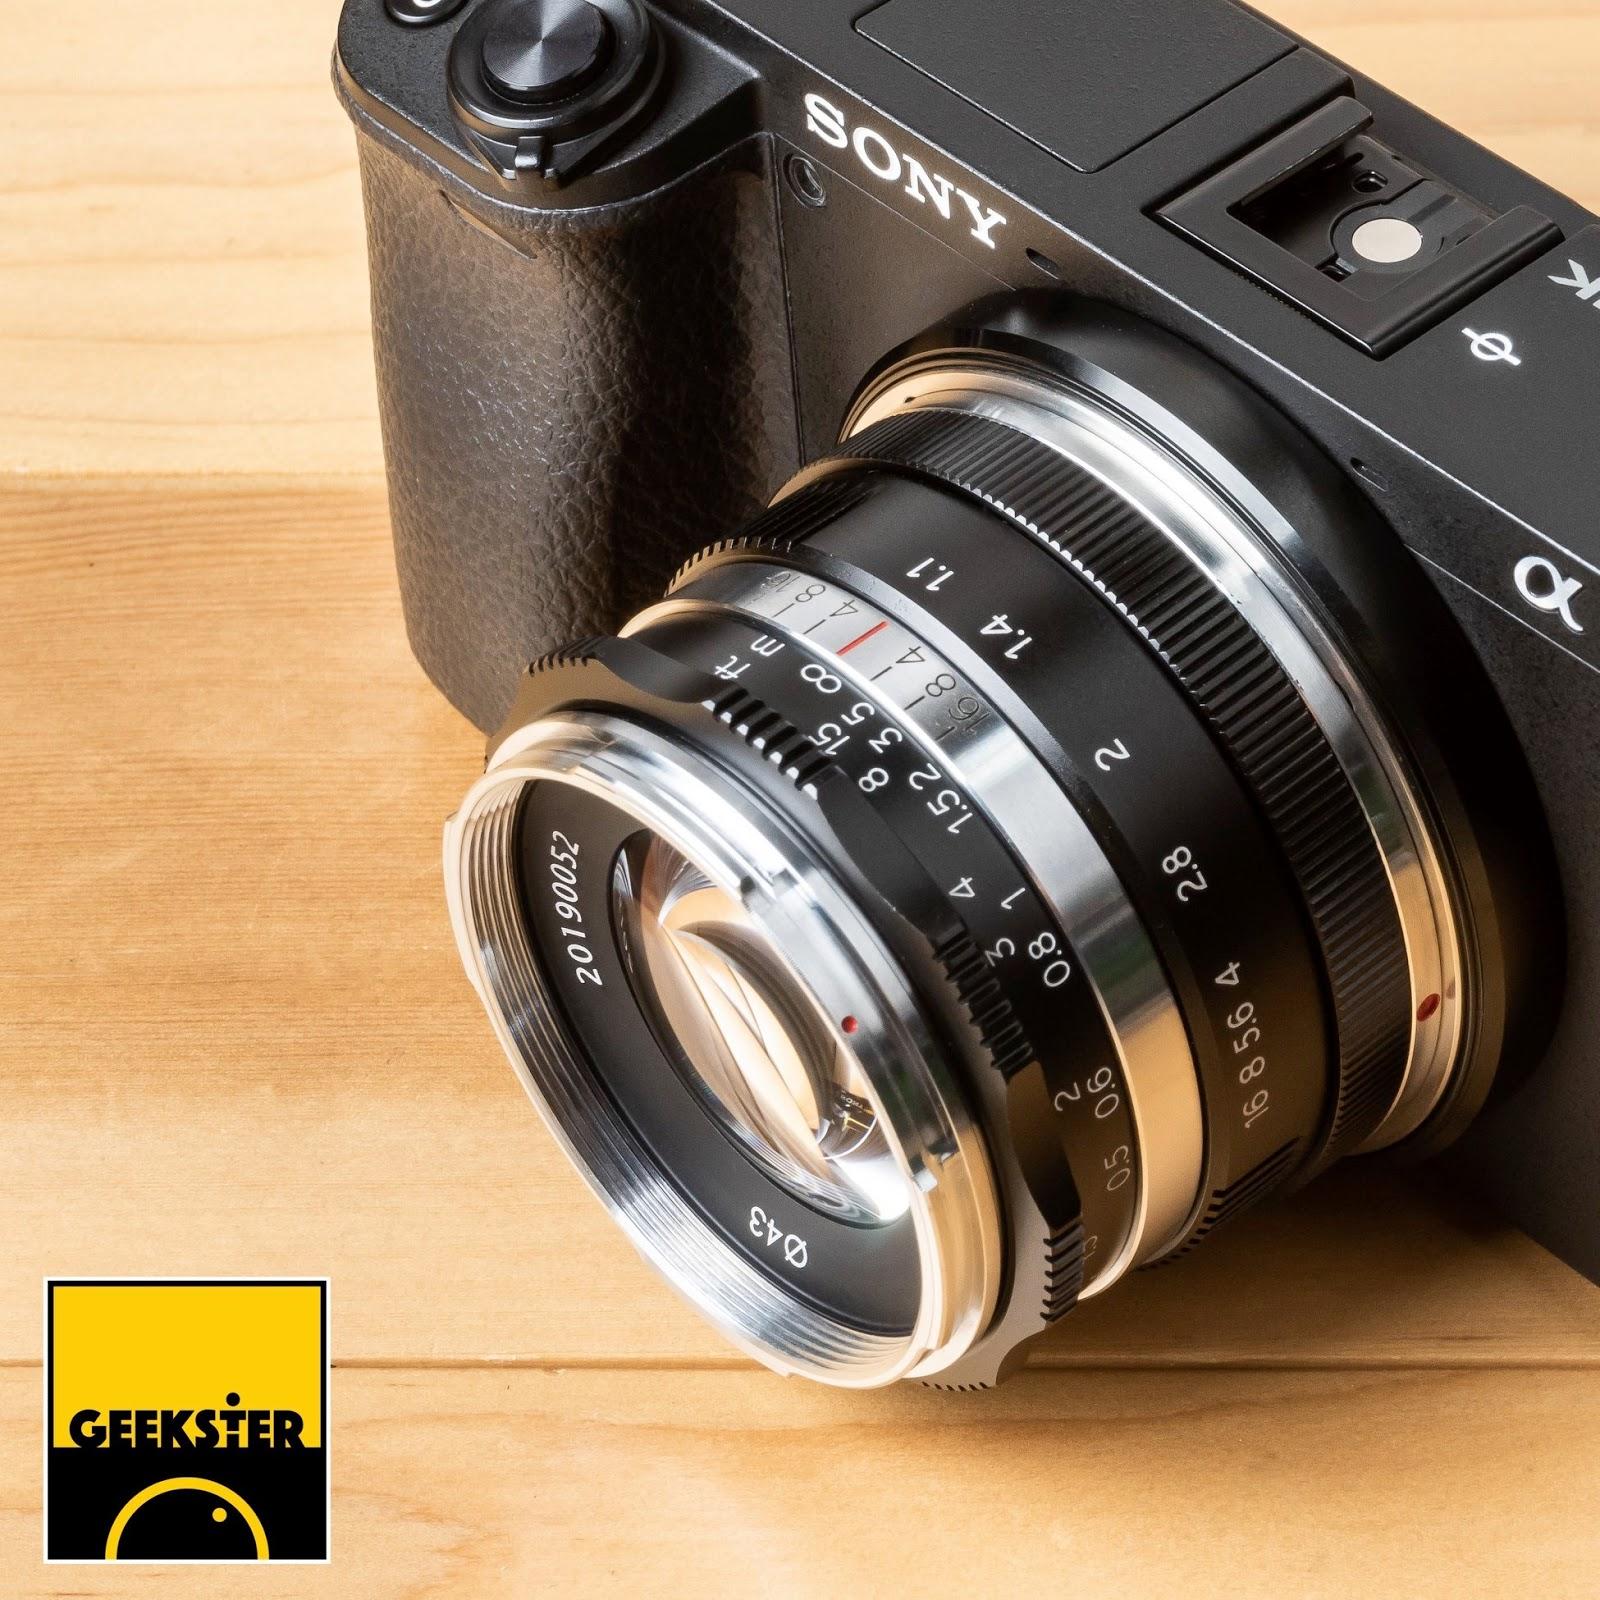 Объектив Geekster 35mm f/1.1 с камерой Sony